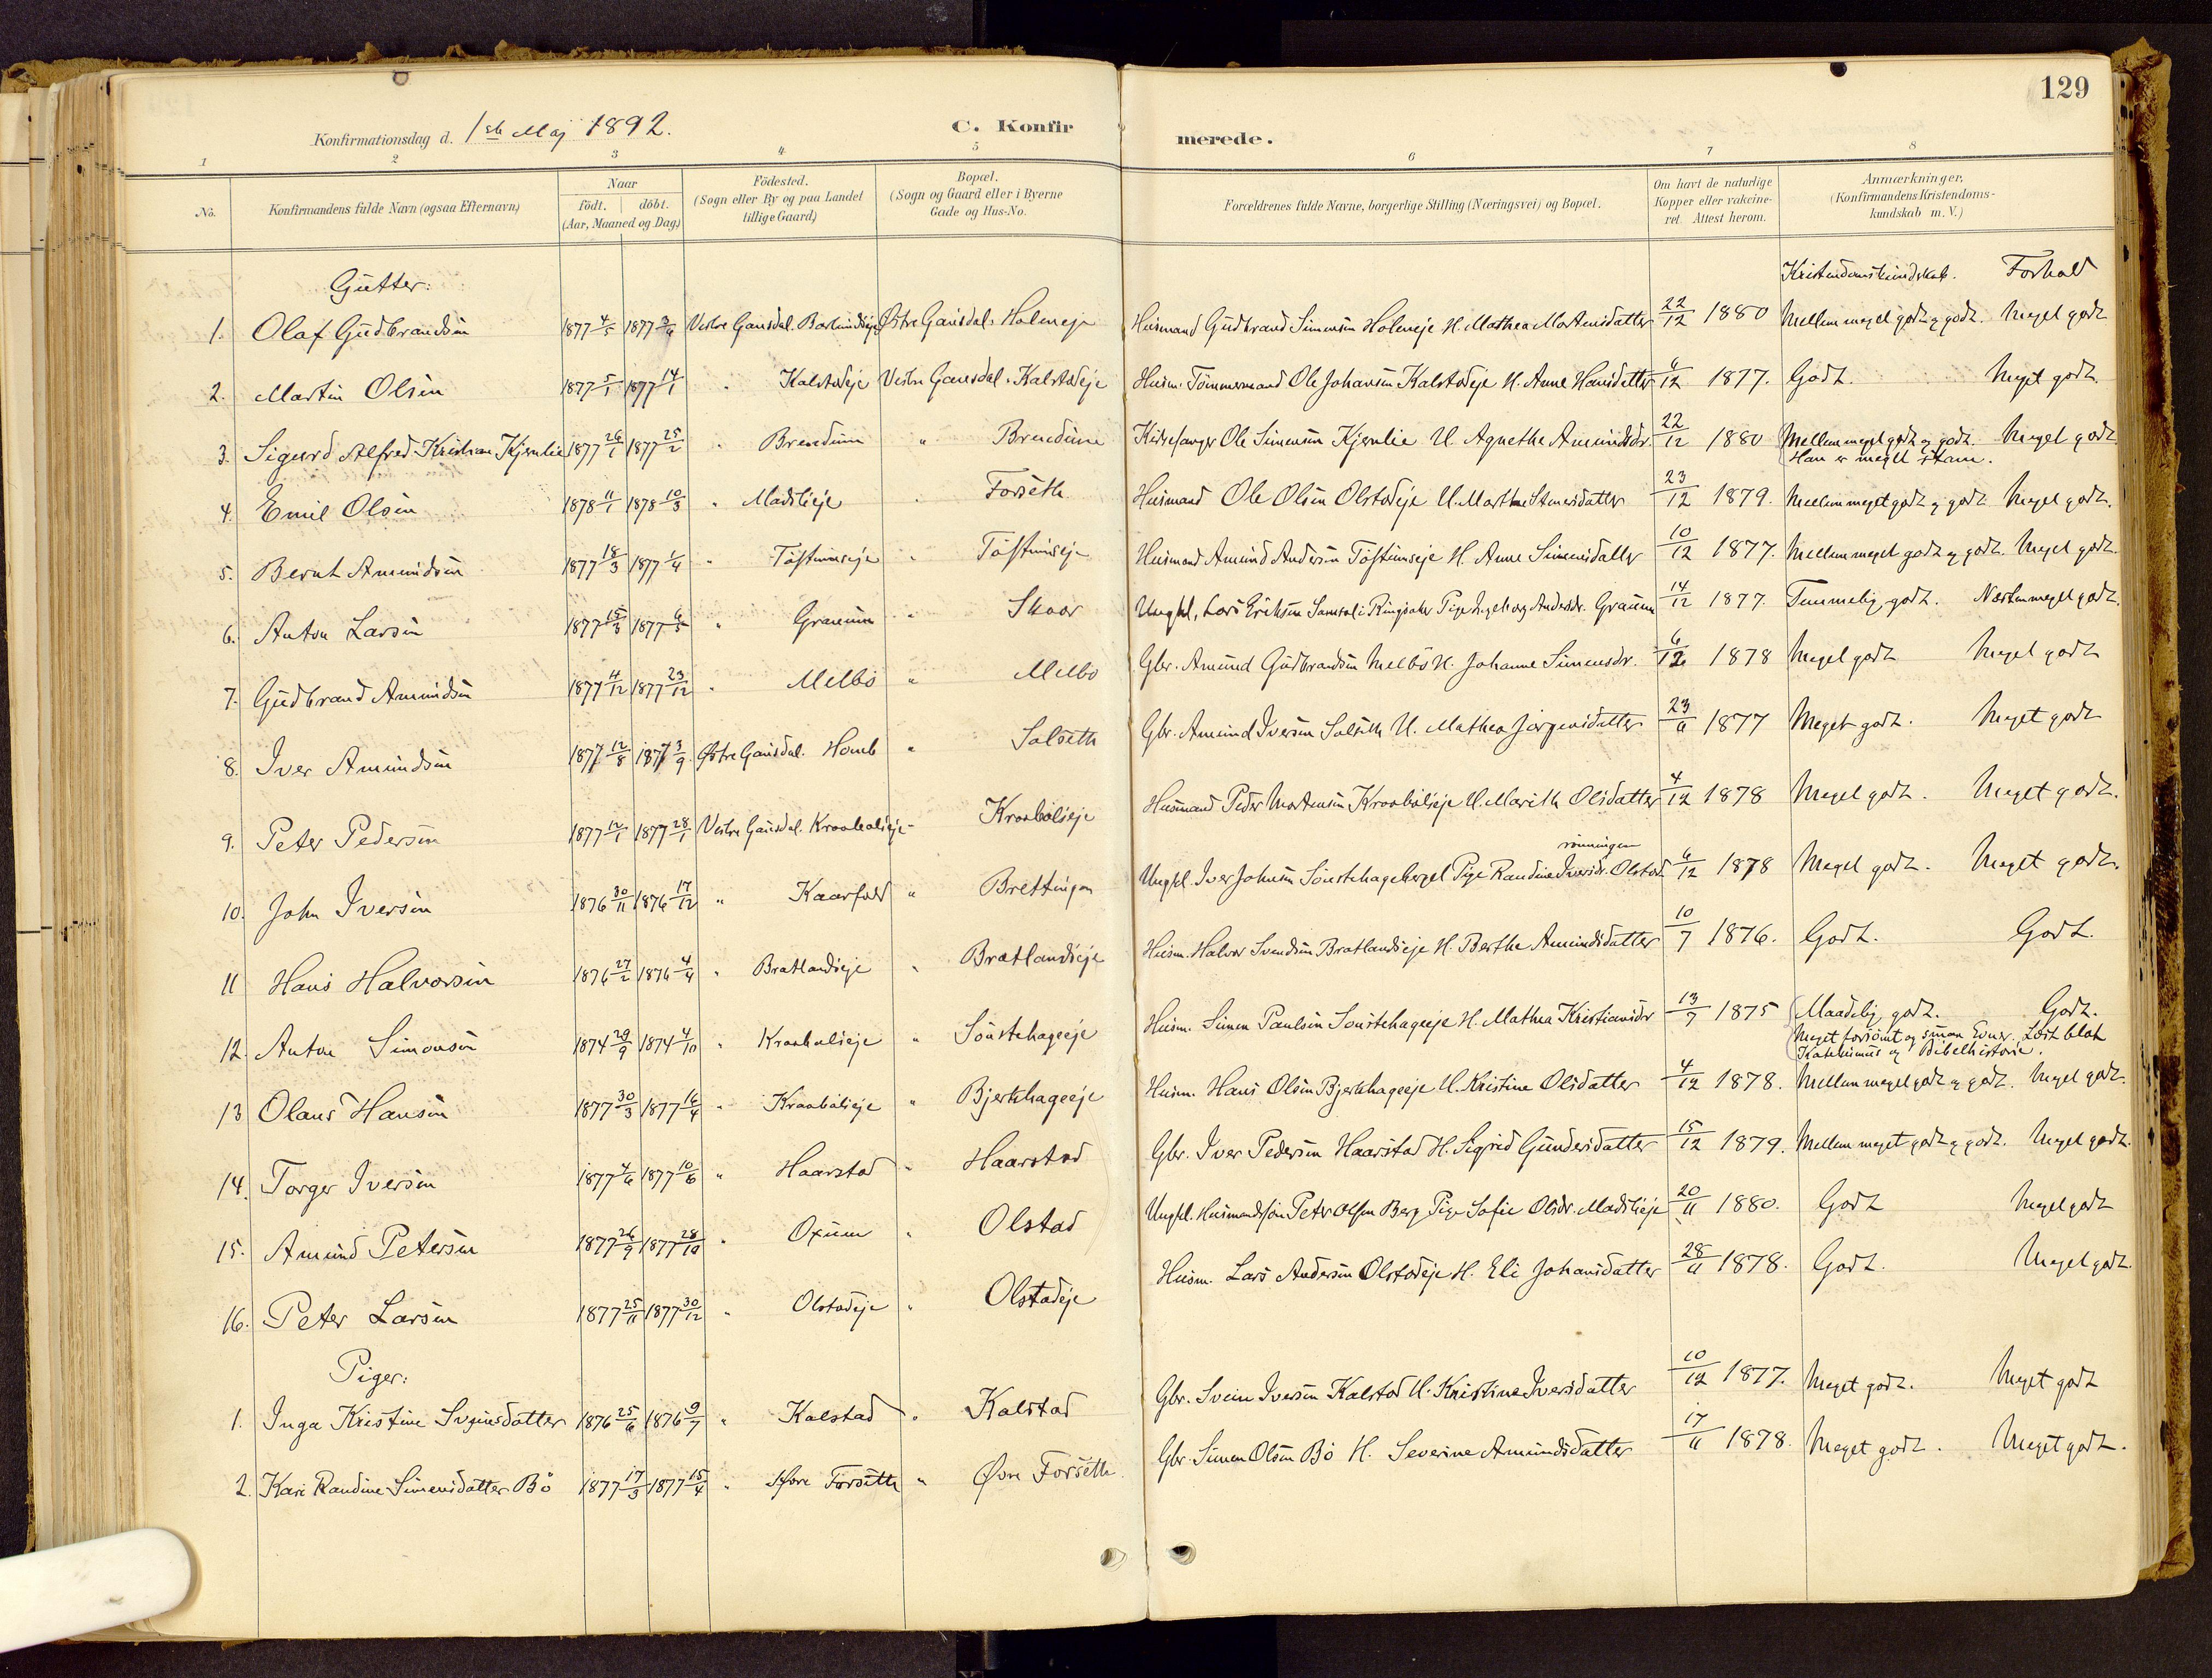 SAH, Vestre Gausdal prestekontor, Ministerialbok nr. 1, 1887-1914, s. 129